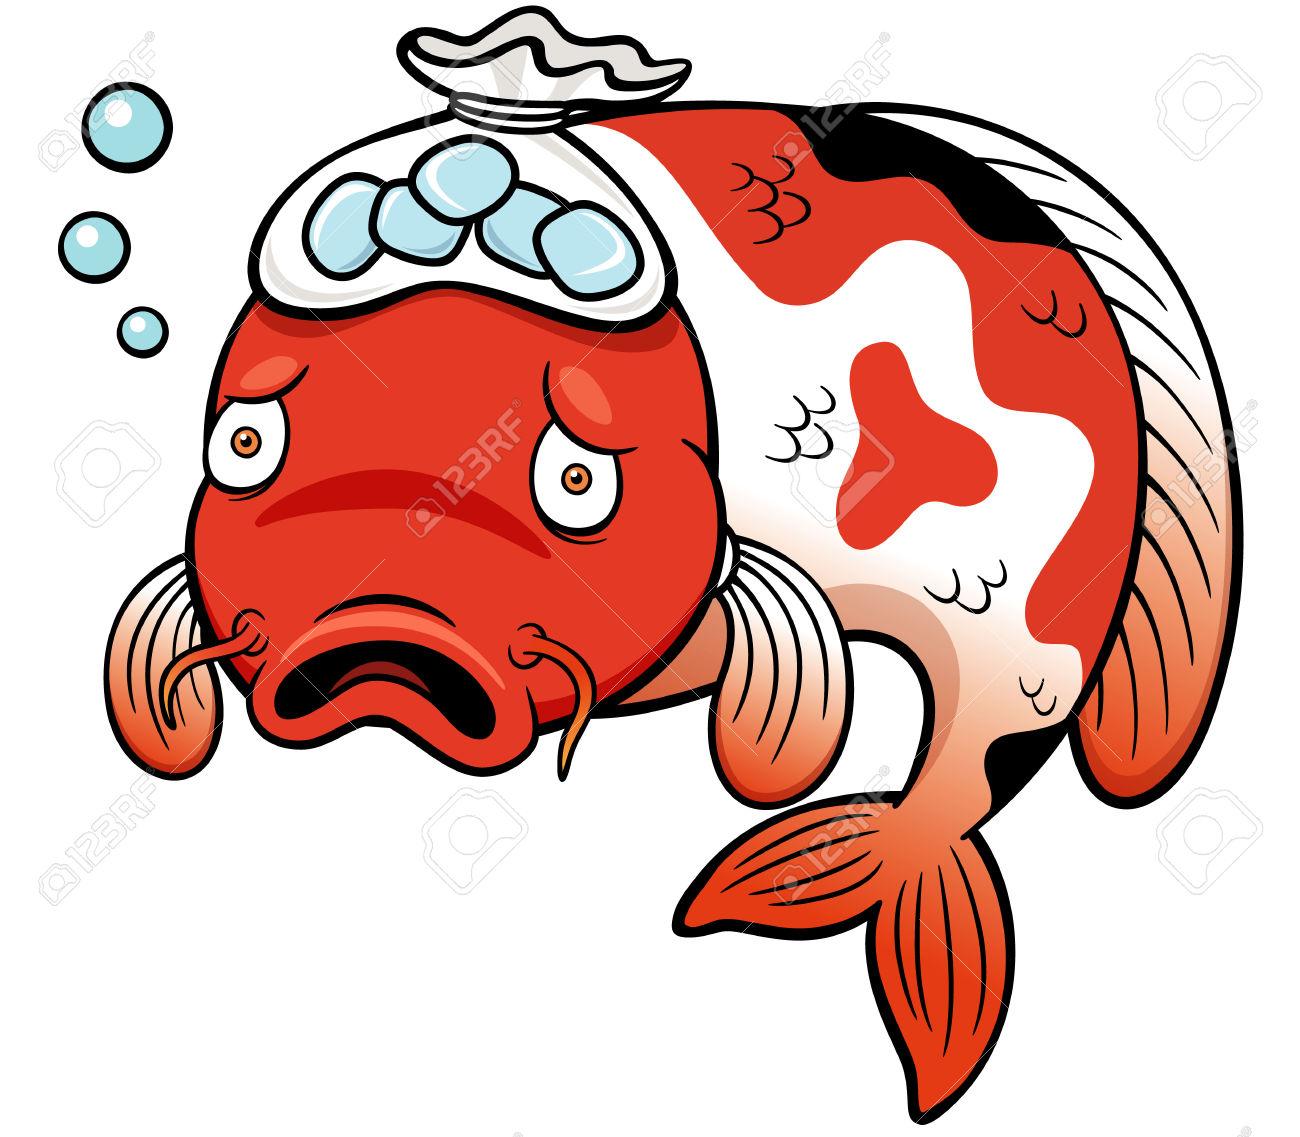 Vector Illustration Of Fish Sick Cartoon Royalty Free Cliparts.